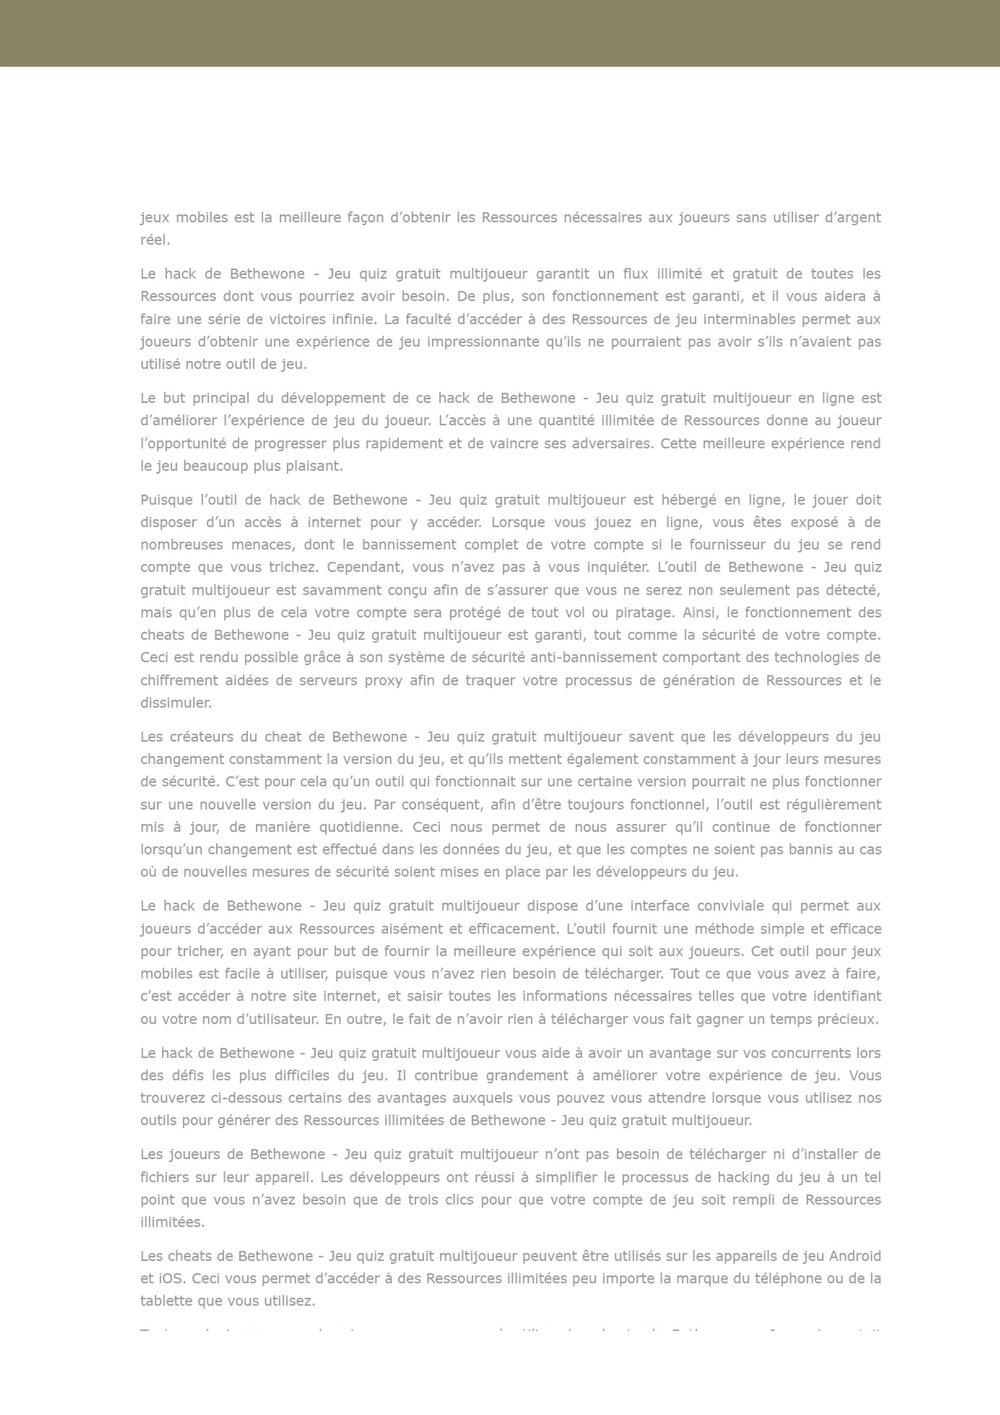 BOOKMEDIA_JANV_WEB9.jpg